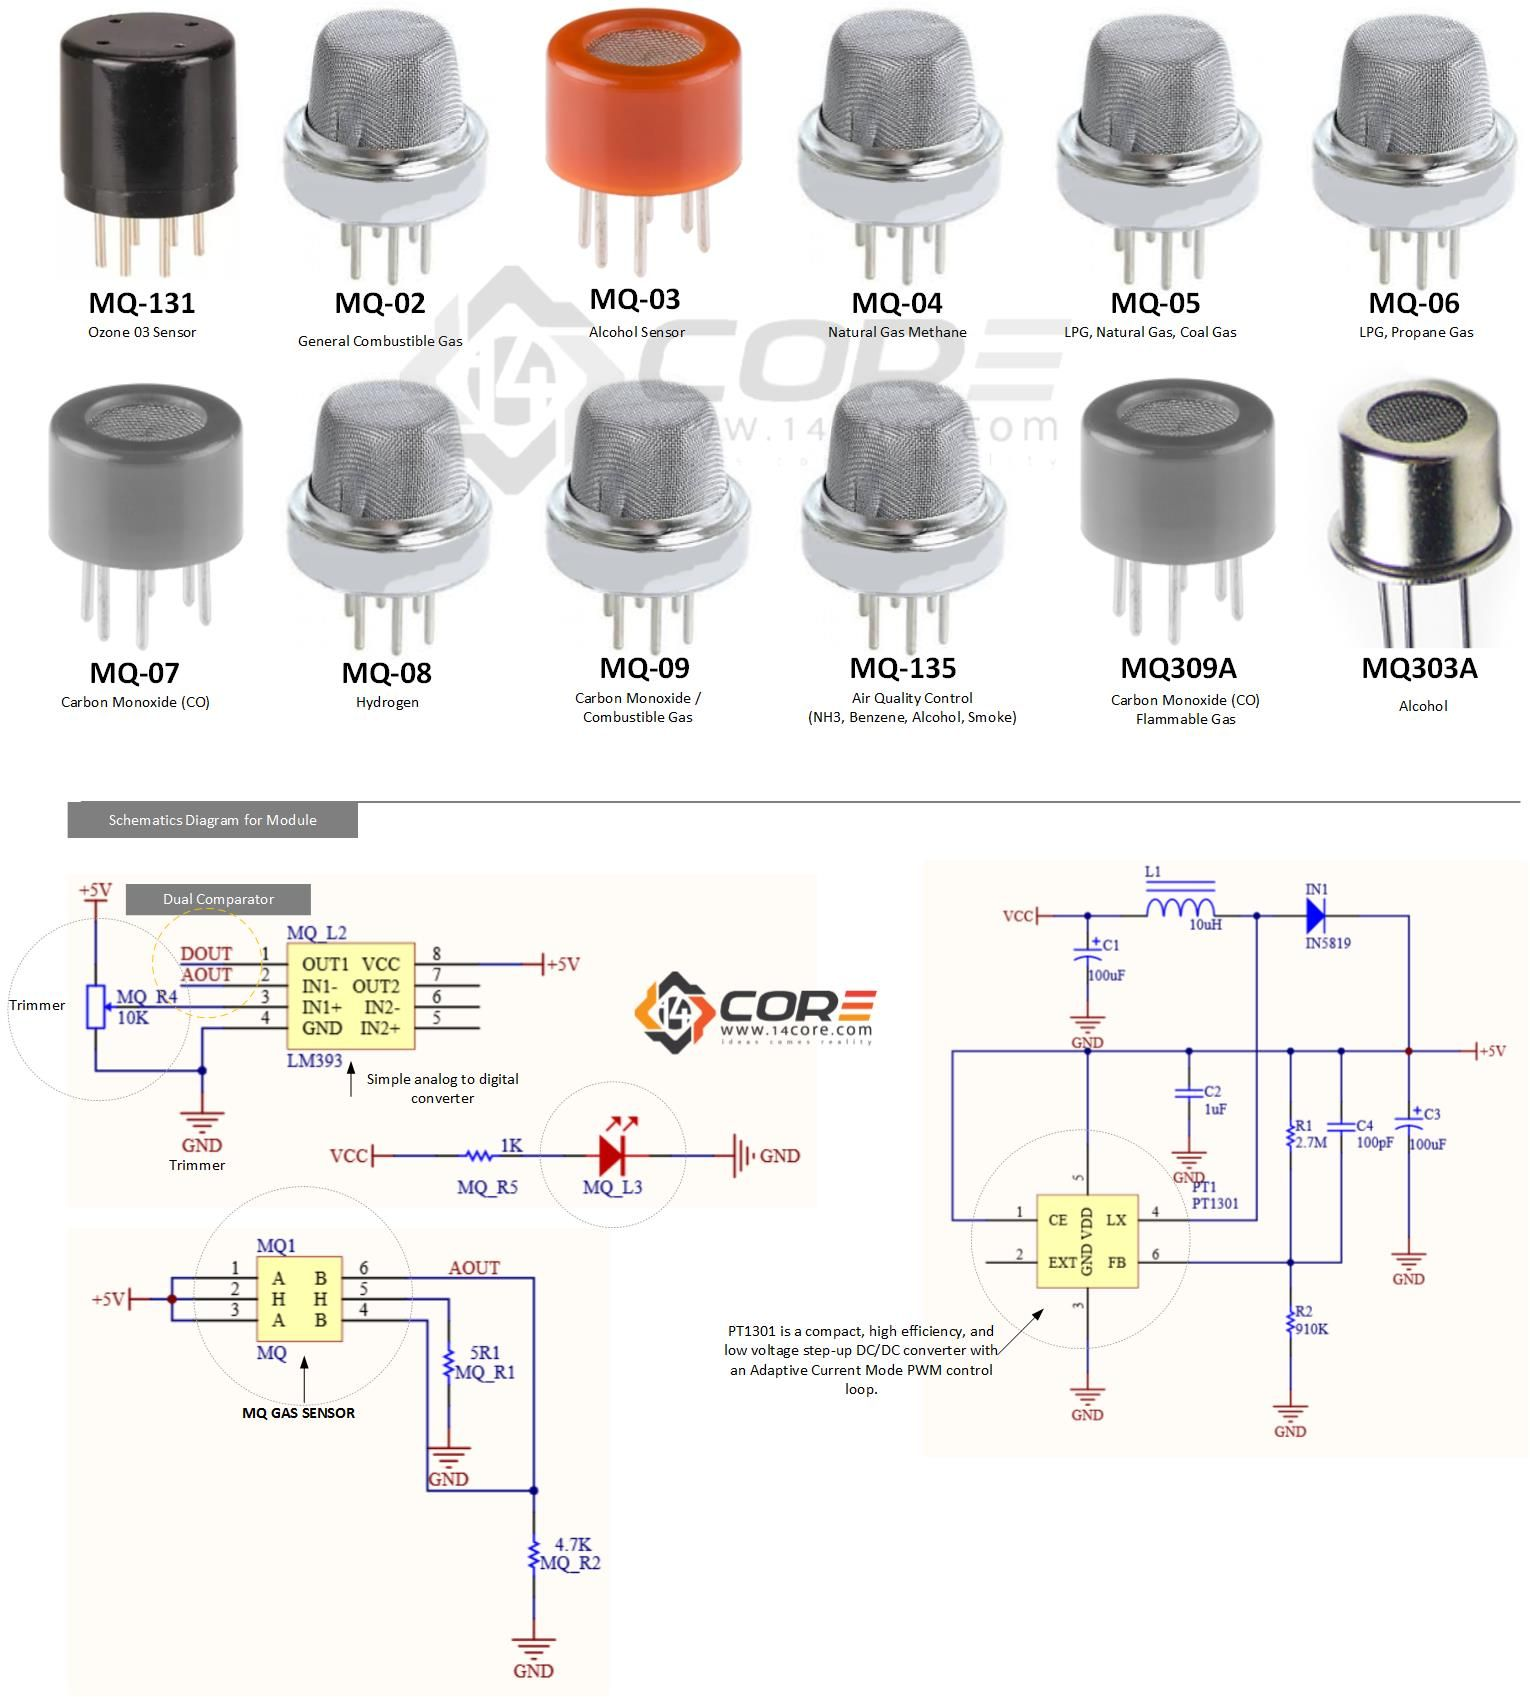 small resolution of wiring the mq xx sensor for ozone lpg c3h8 co h c2h6o c6h6 gas detection on stm32f 14core com